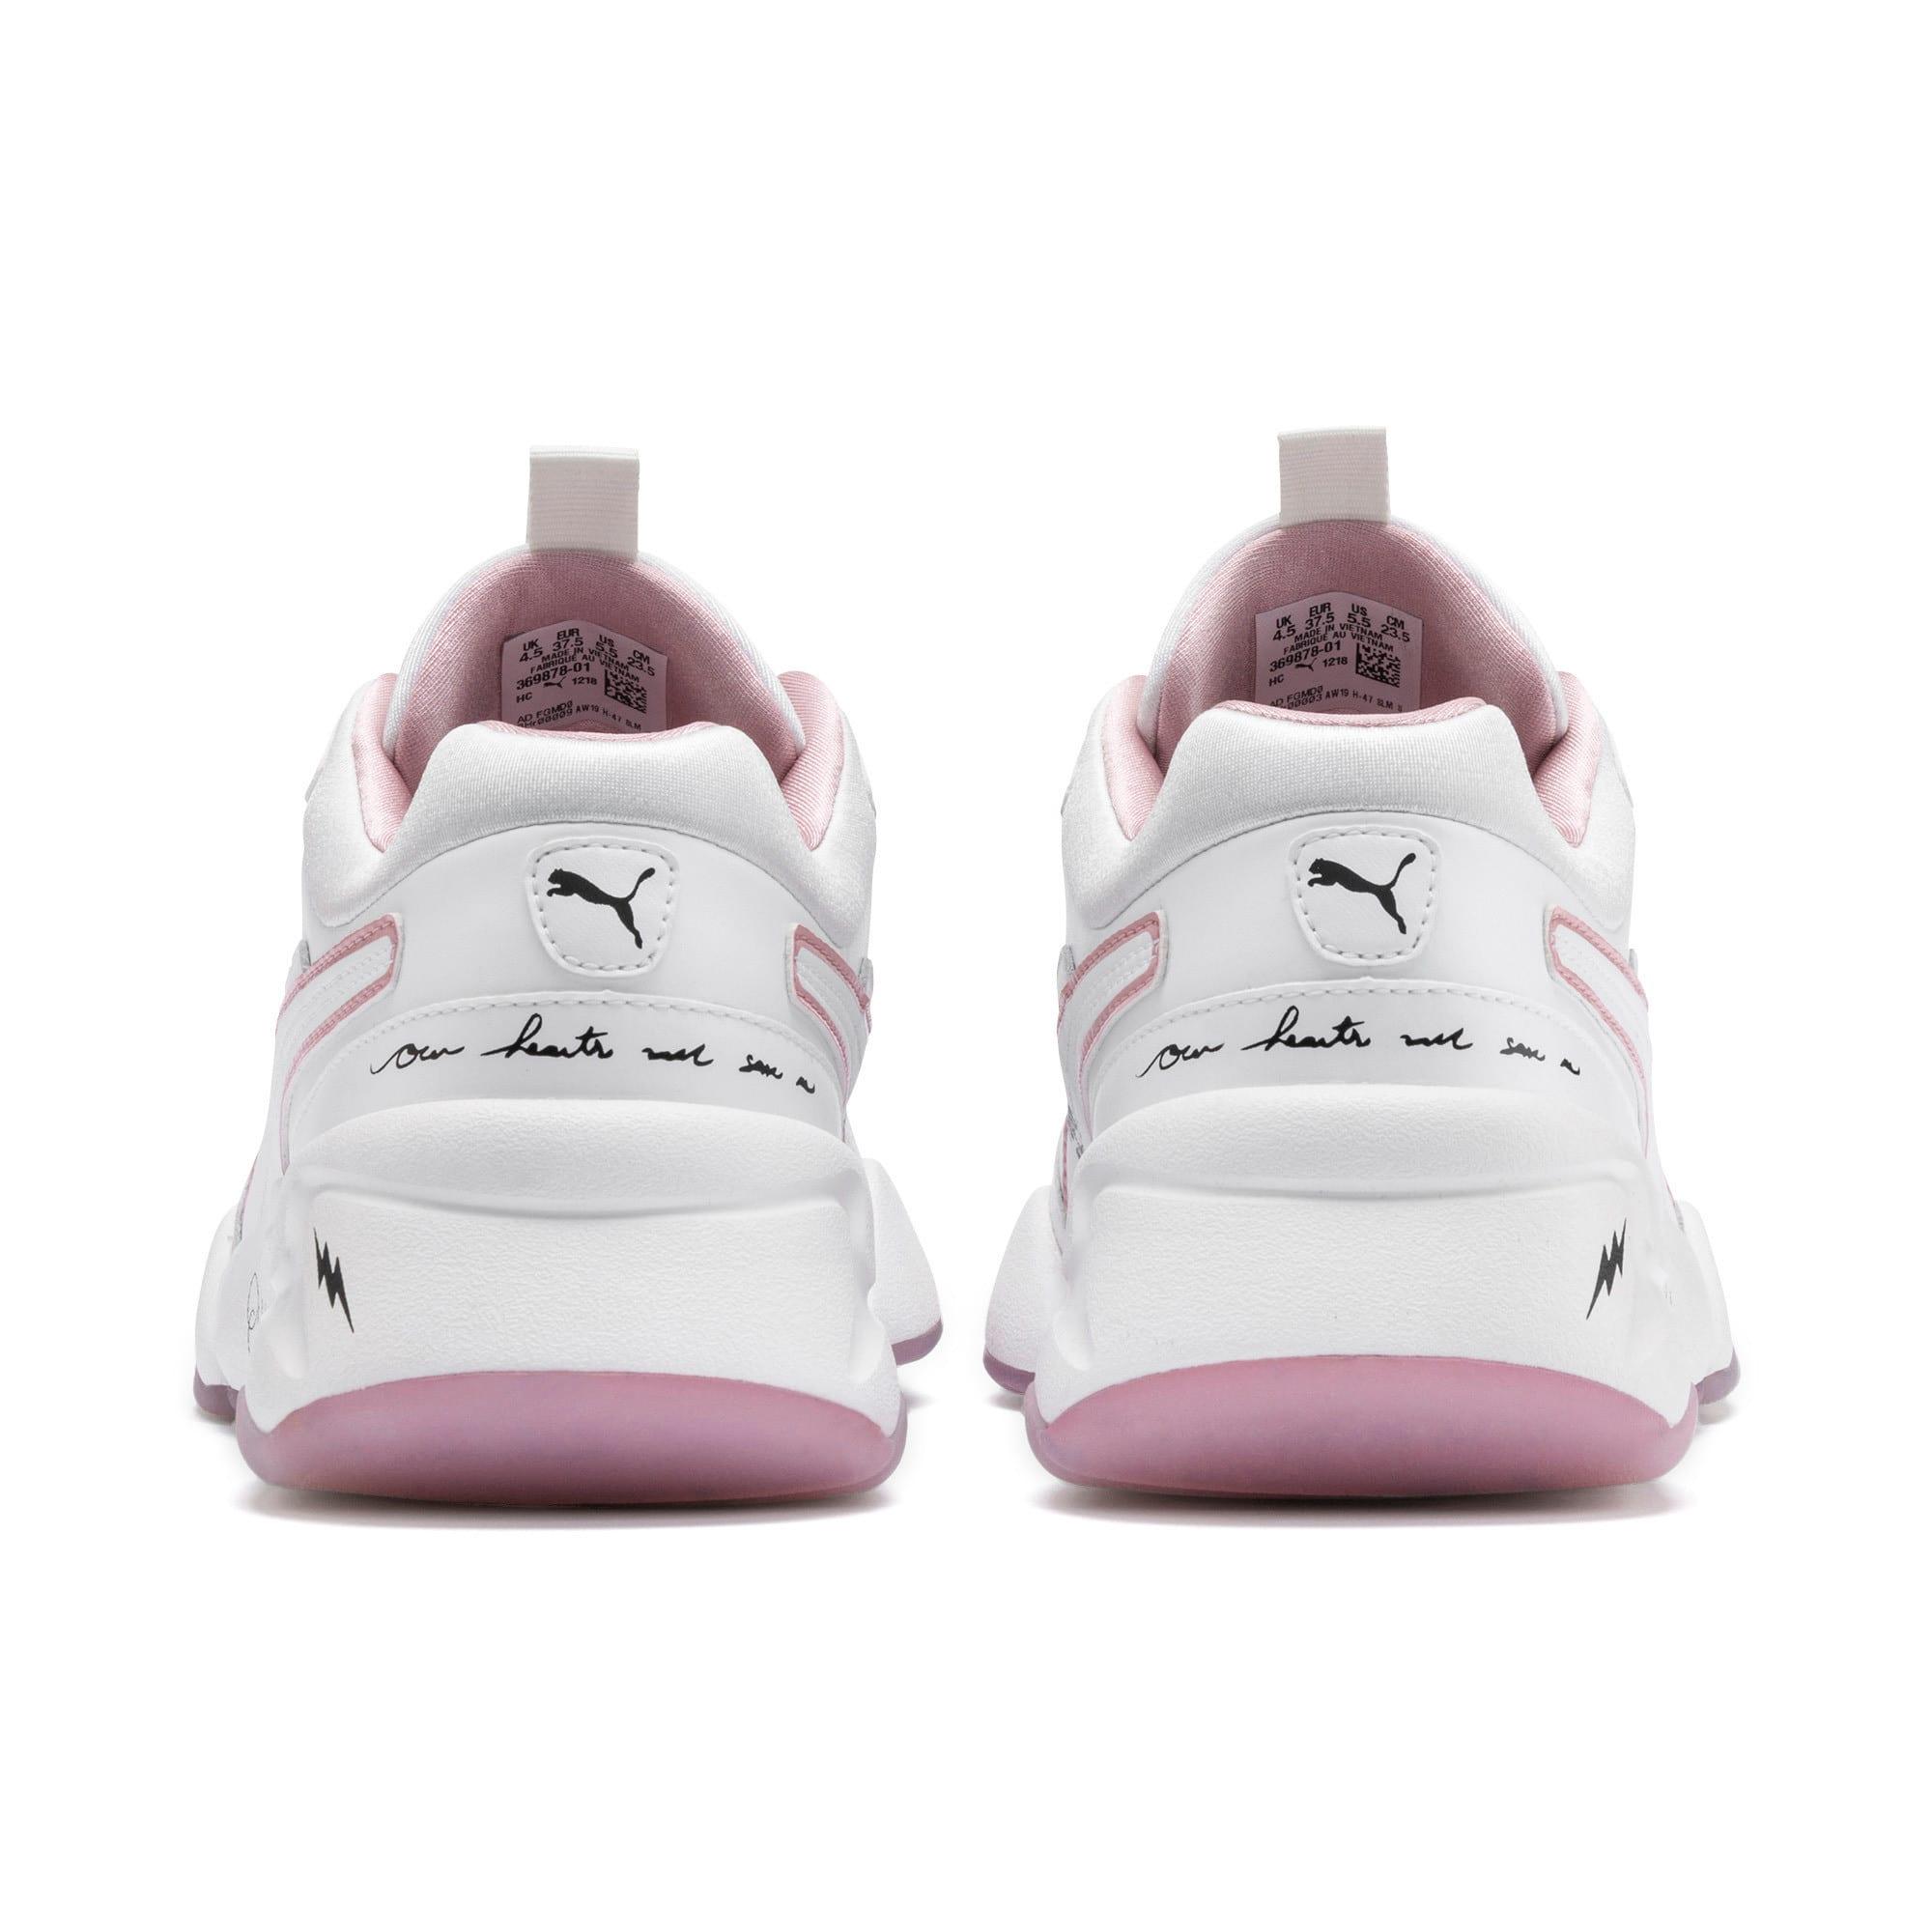 Thumbnail 3 of PUMA x SUE TSAI Nova Women's Sneakers, Bright White-Bright White, medium